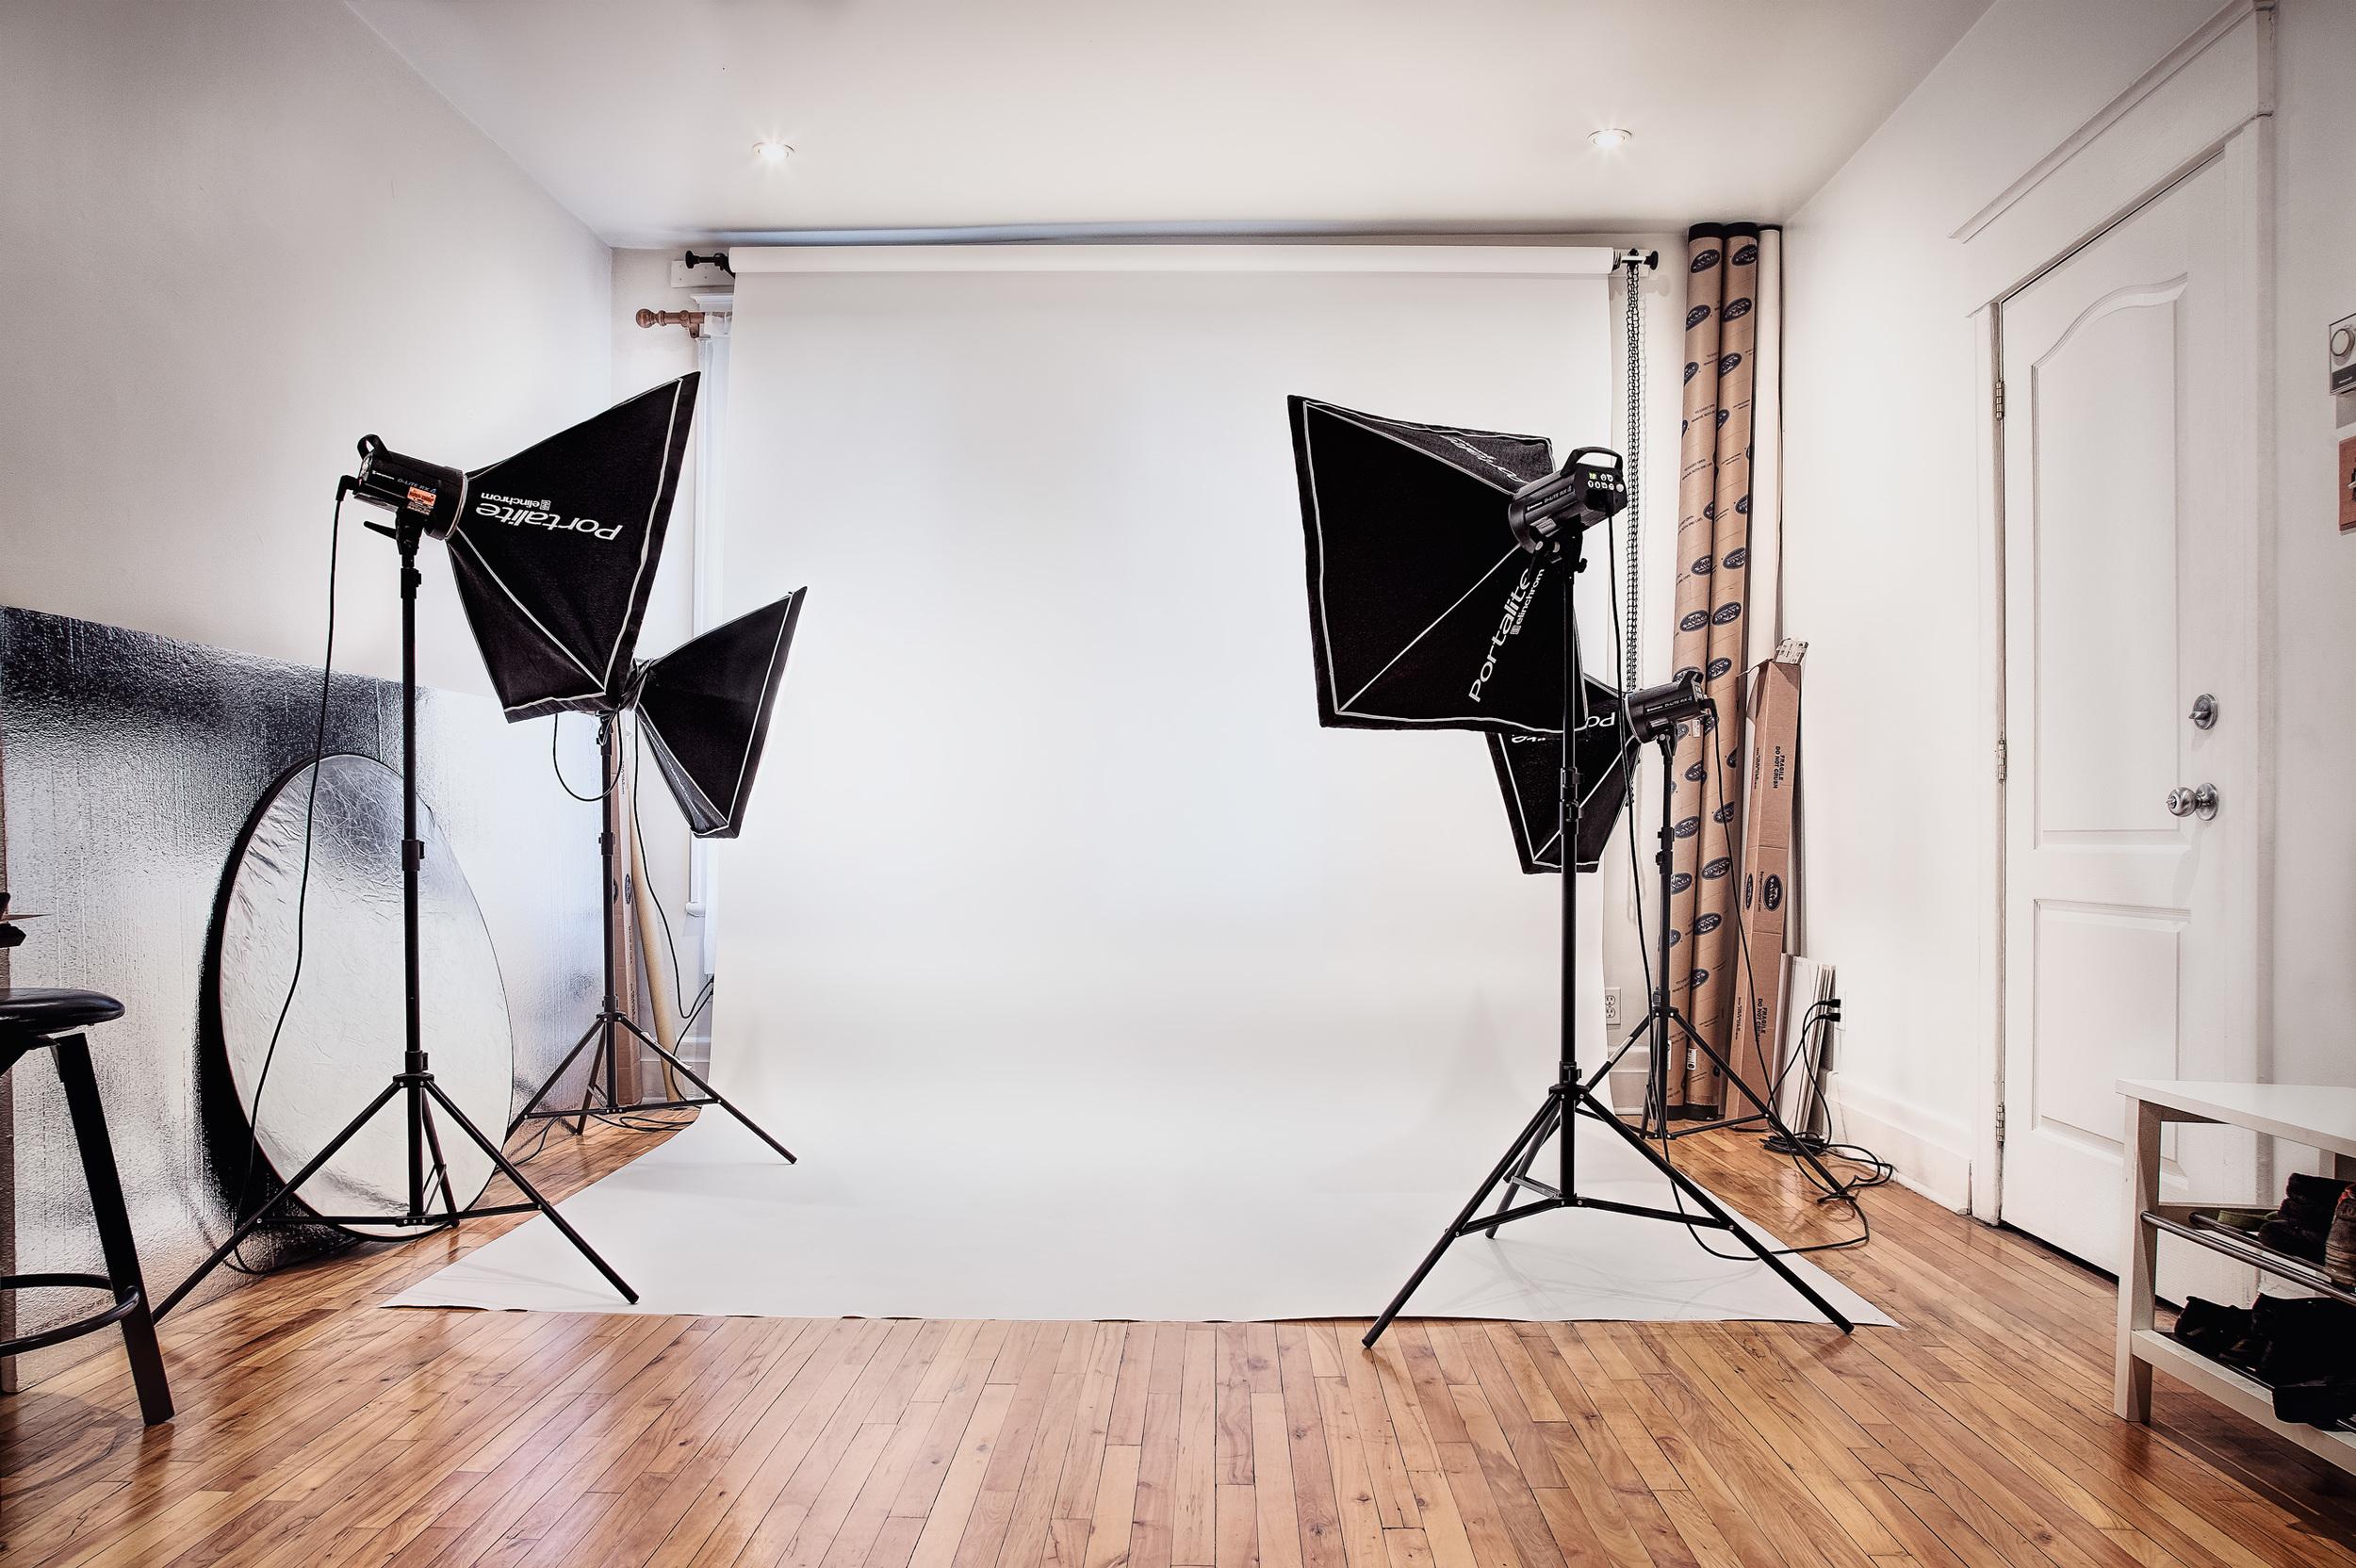 Tora Photography - Montreal Photography Studio.jpg